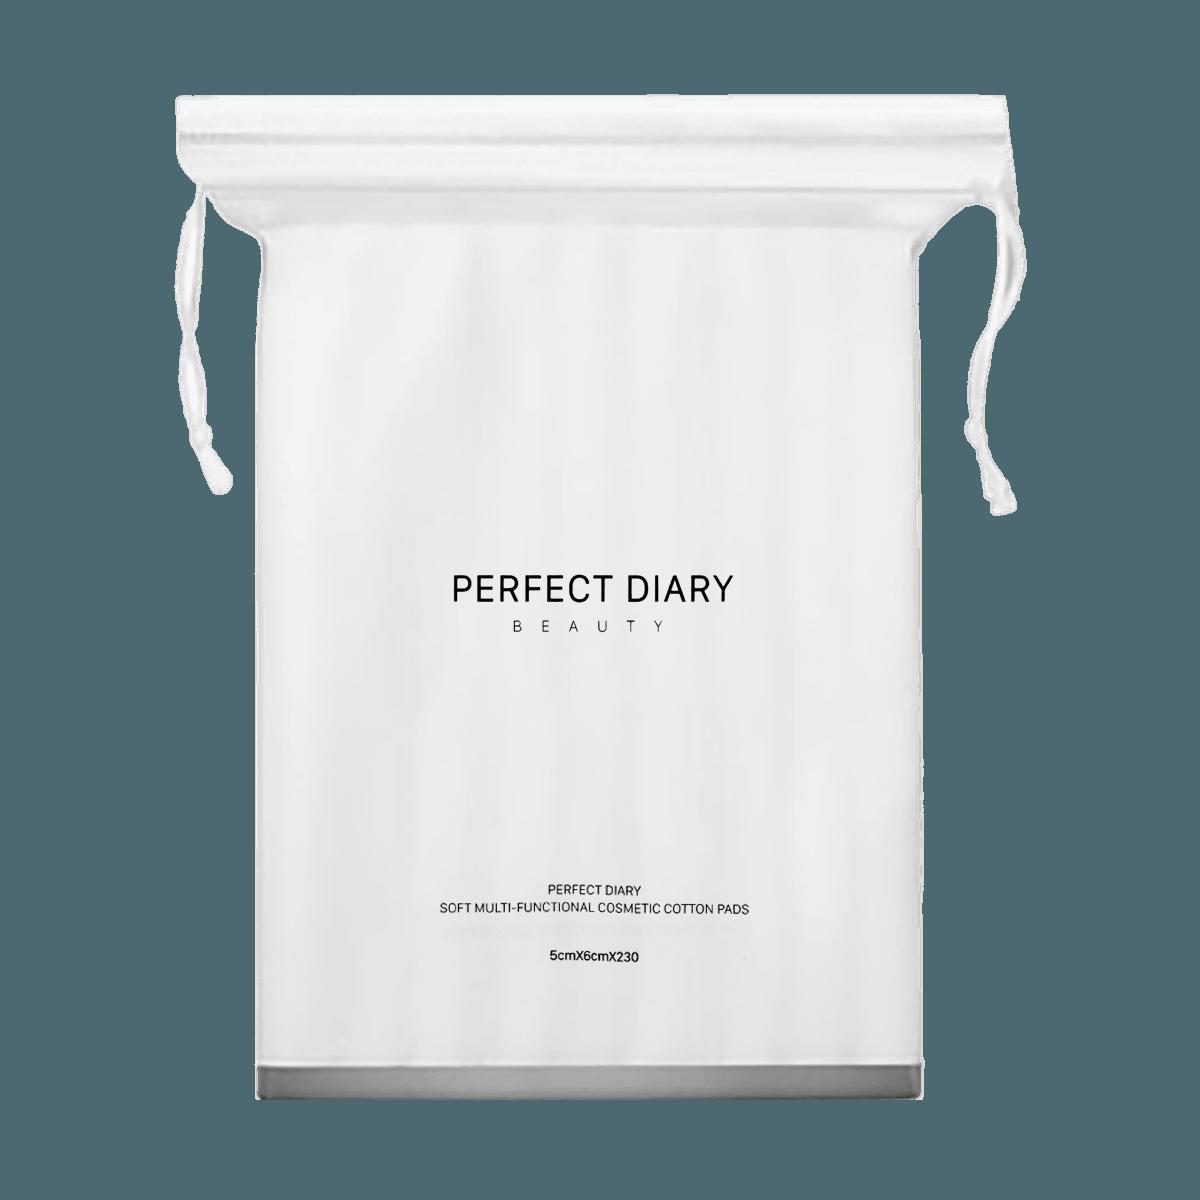 Yamibuy.com:Customer reviews:PERFECT DIARY Soft Multi-Functional Cosmetic Cotton Pads 230pcs